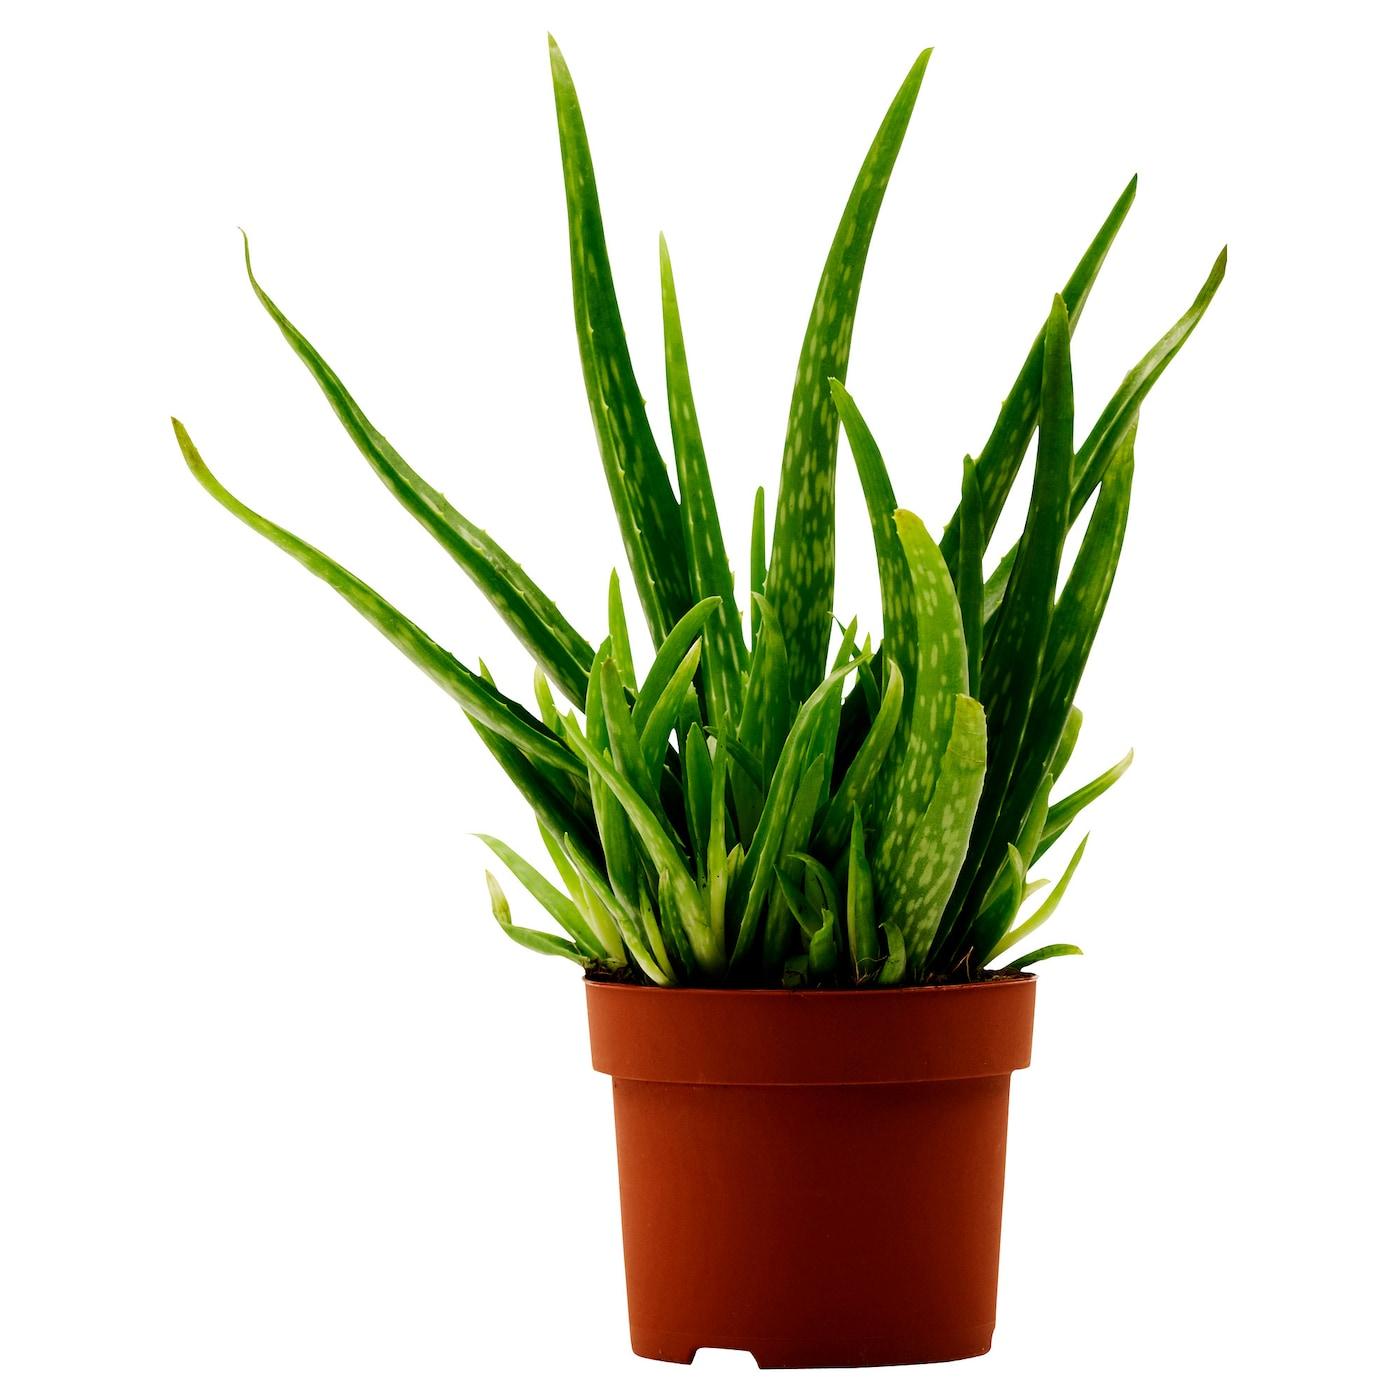 aloe vera potted plant aloe 12 cm ikea. Black Bedroom Furniture Sets. Home Design Ideas